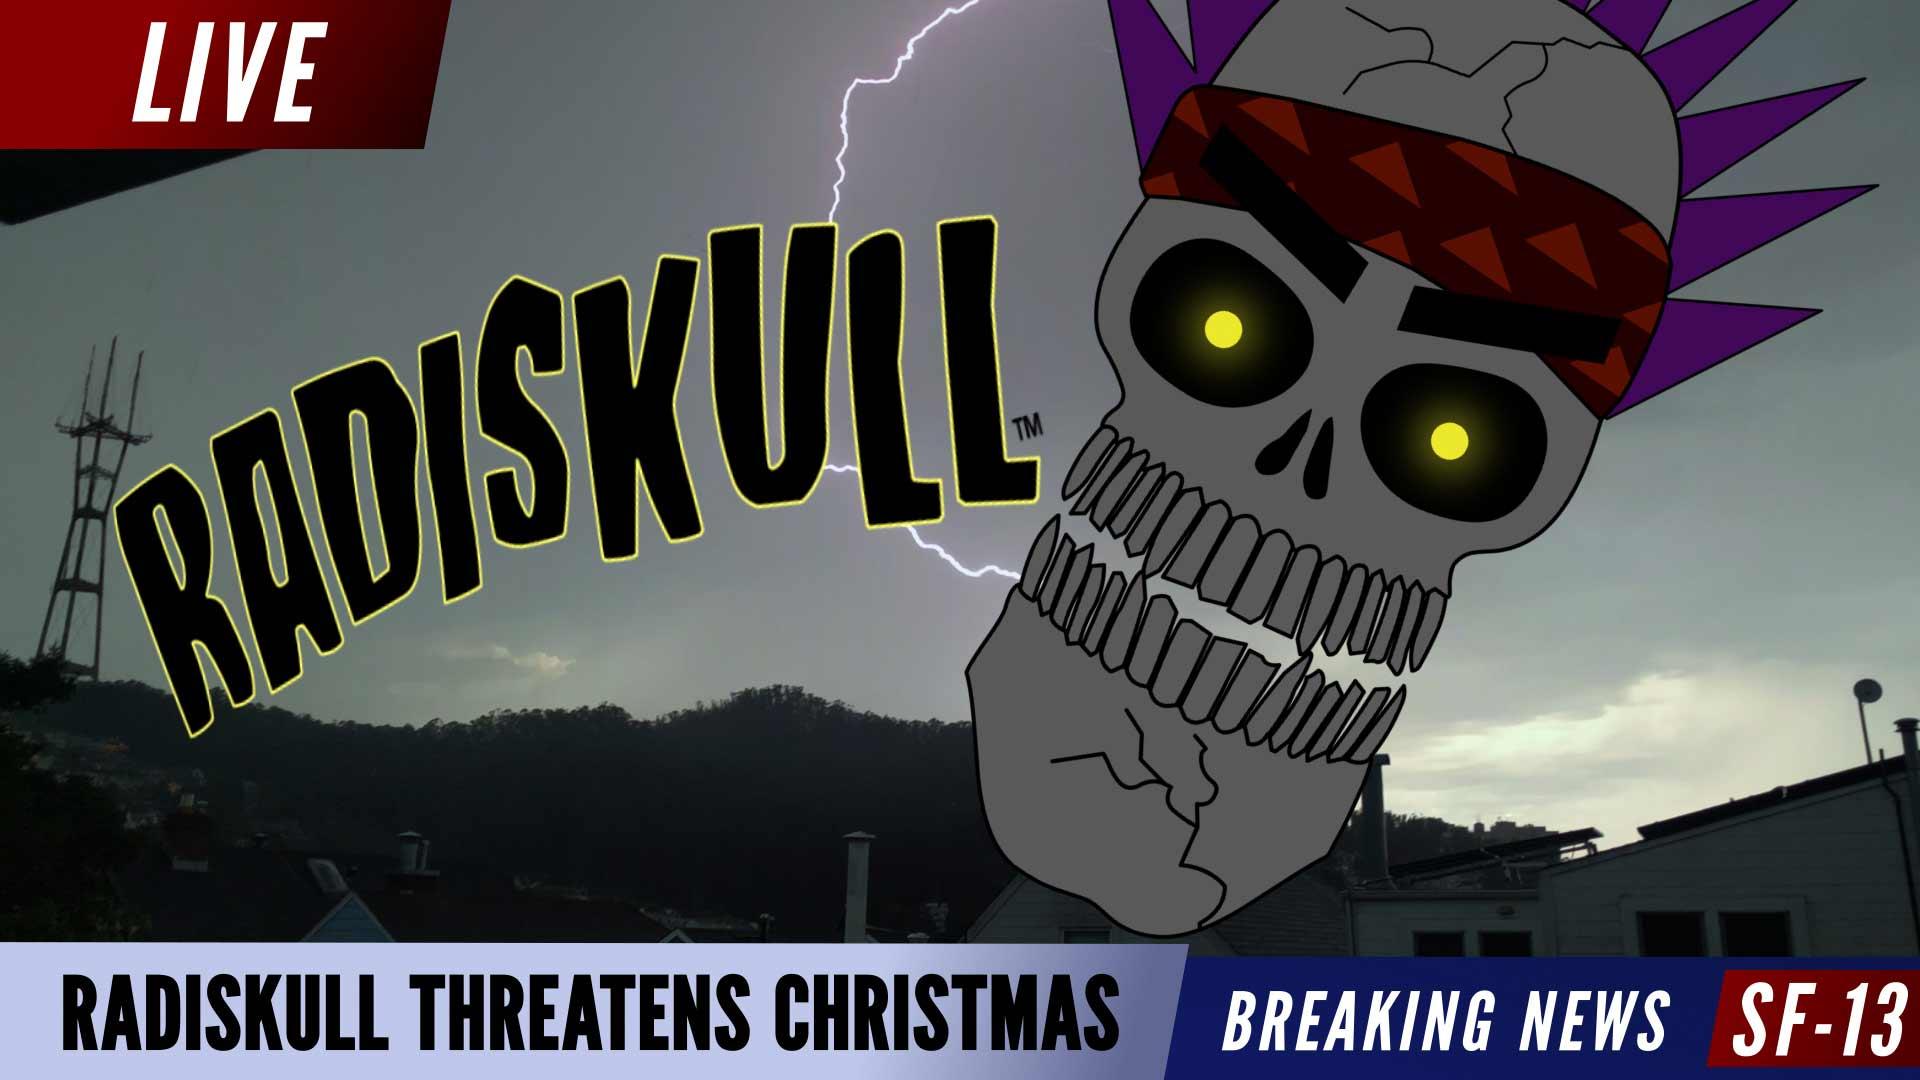 Radiskull Threatens Christmas